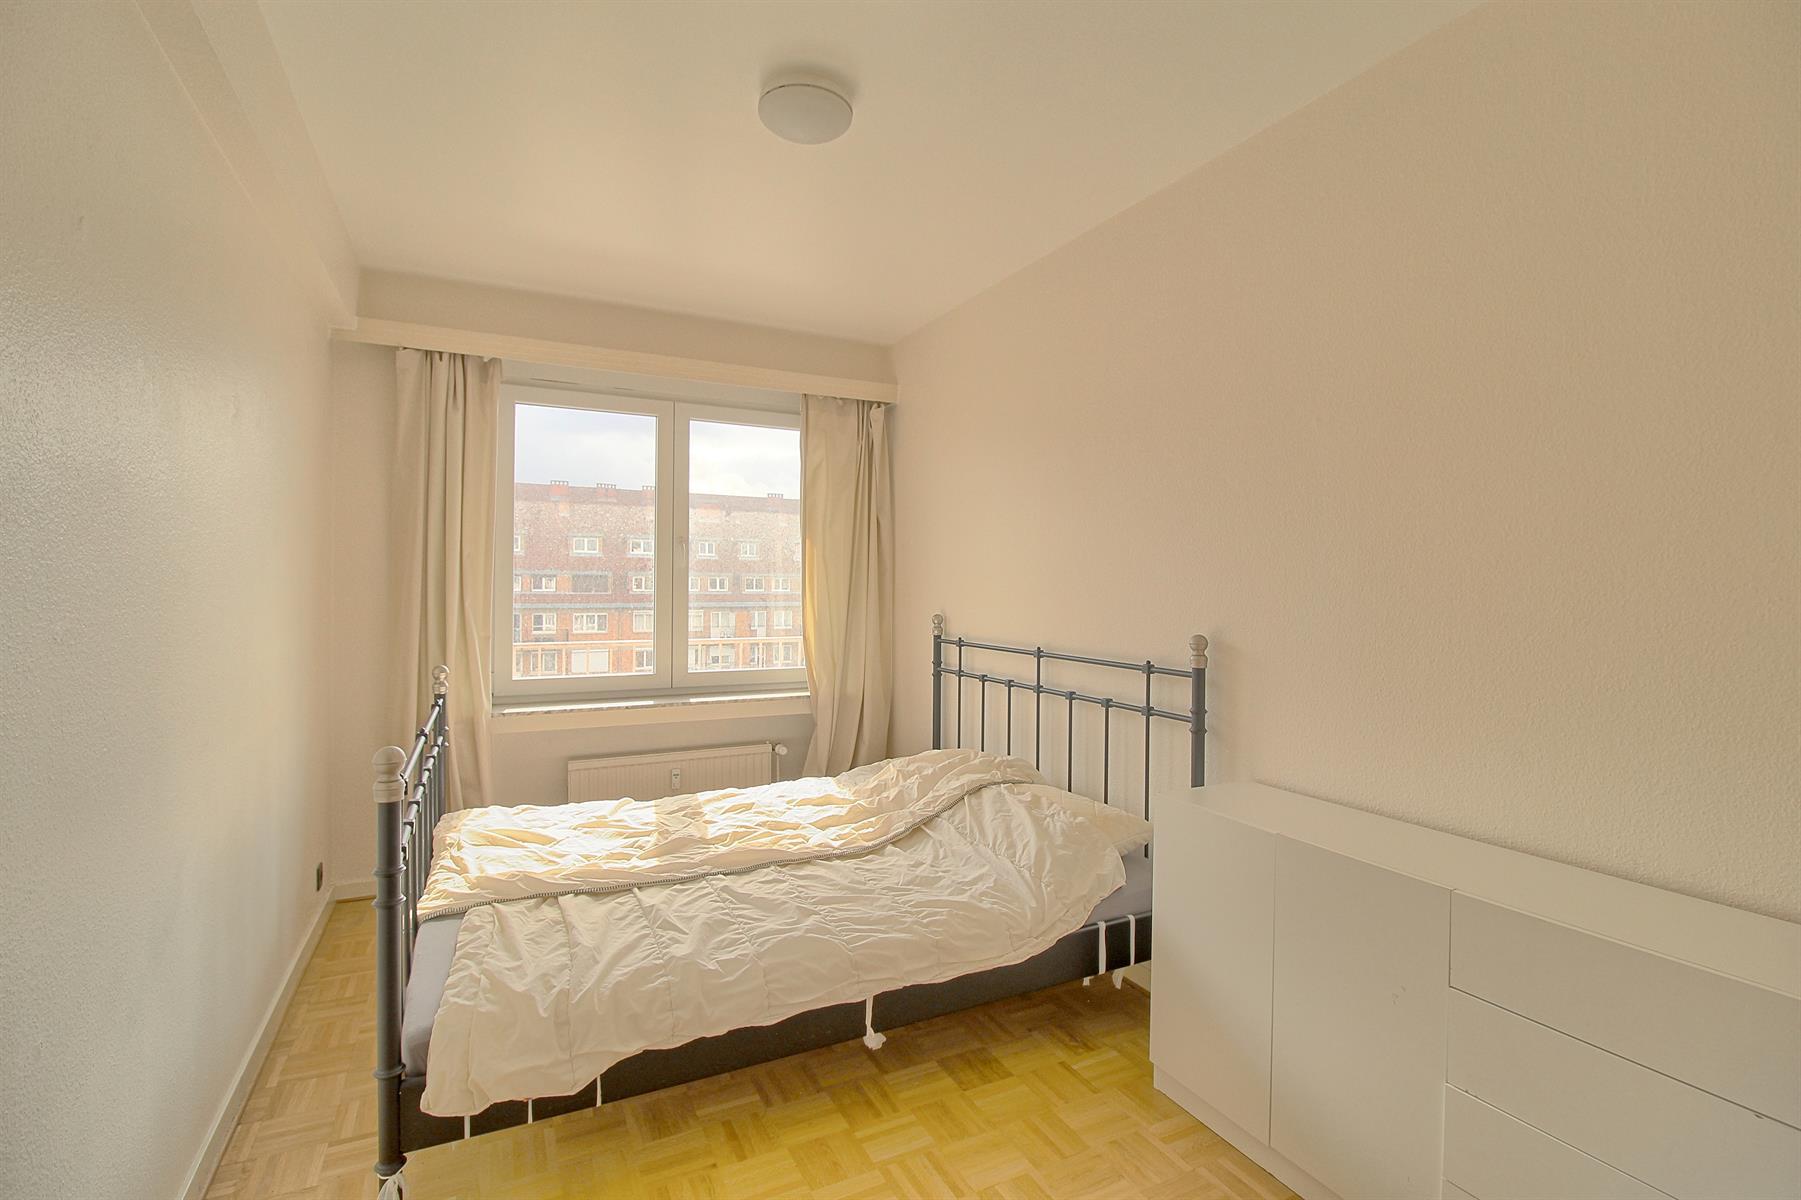 Appartement - Woluwe-Saint-Lambert - #4180127-4